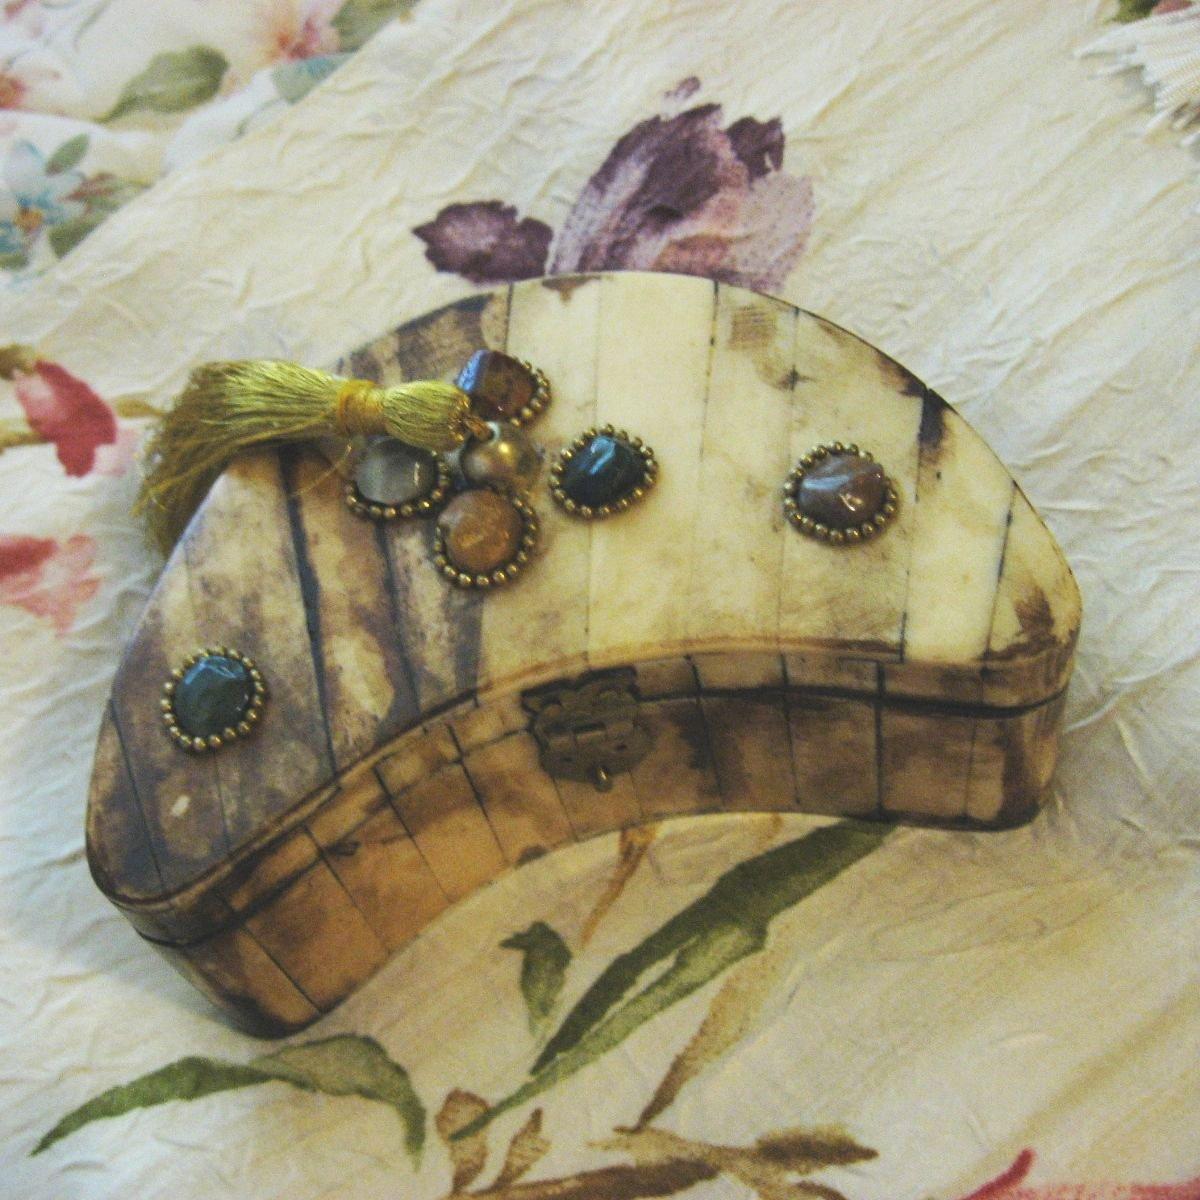 Handmade Crescent Shaped Camel Bone Trinket Box, 5.5 Inches